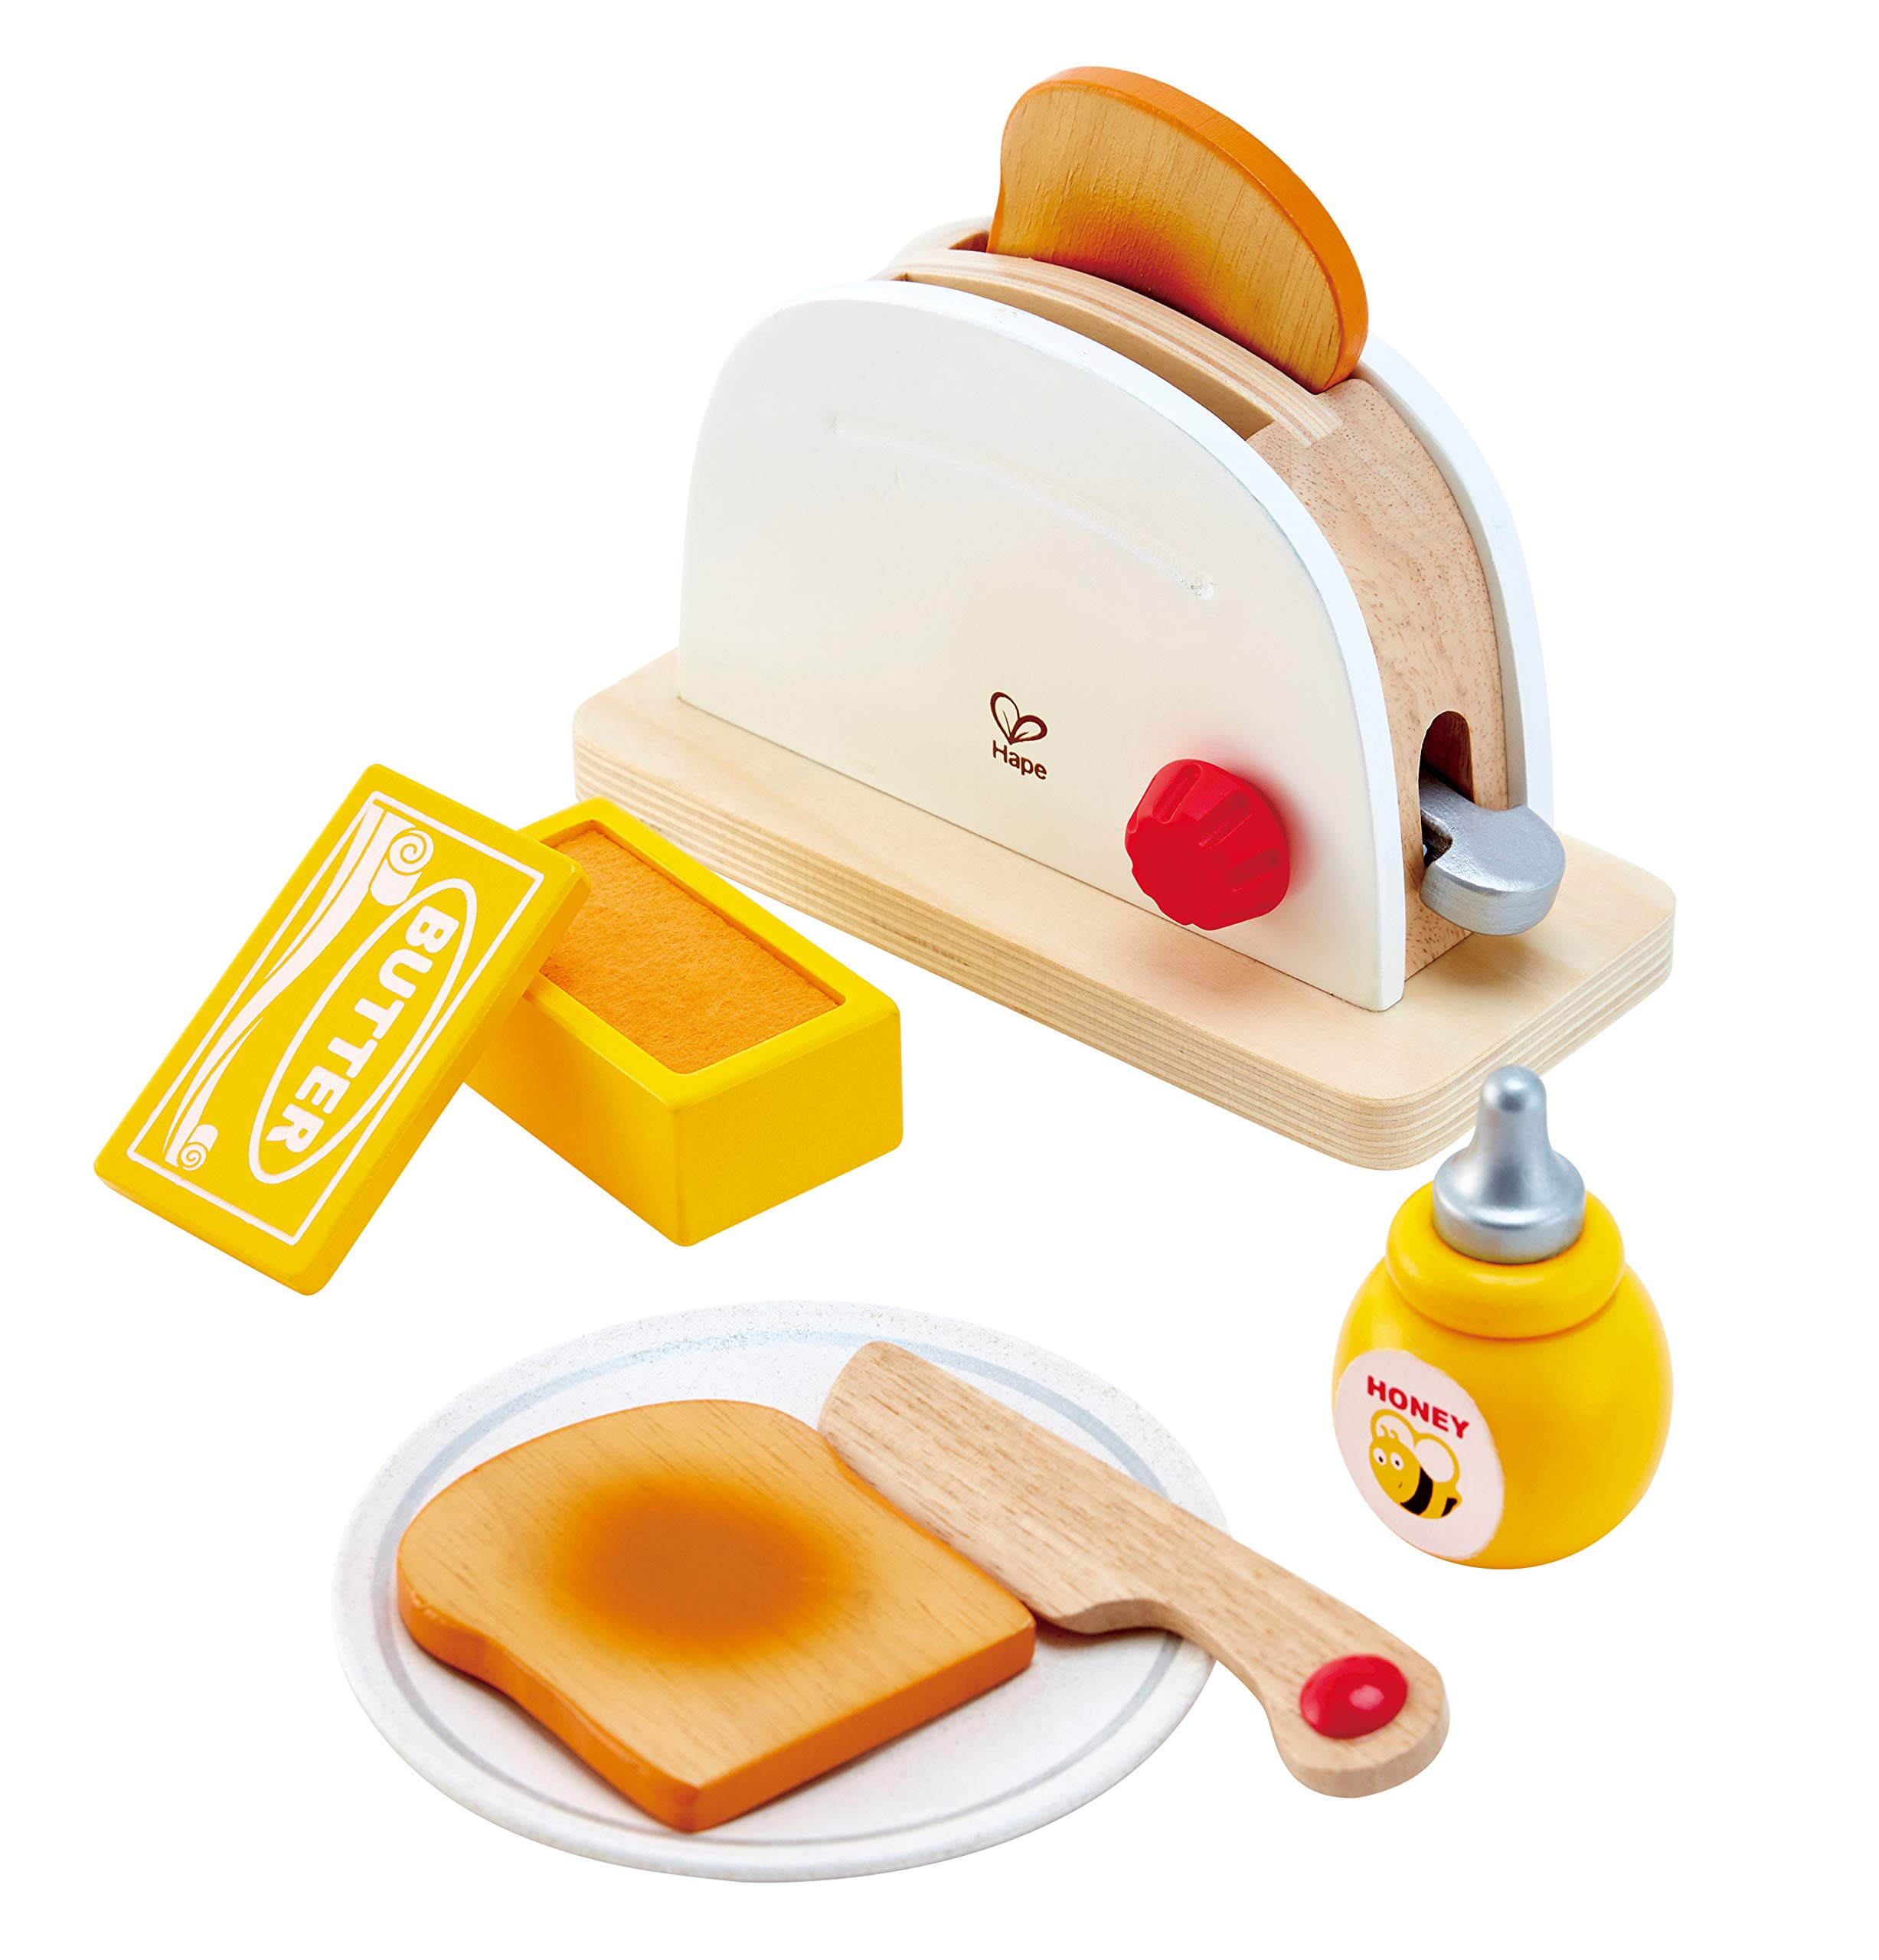 Hape White Wooden Pop-Up Toaster Set, Pretend Play Kitchen Accessories for Kids Preschoolers